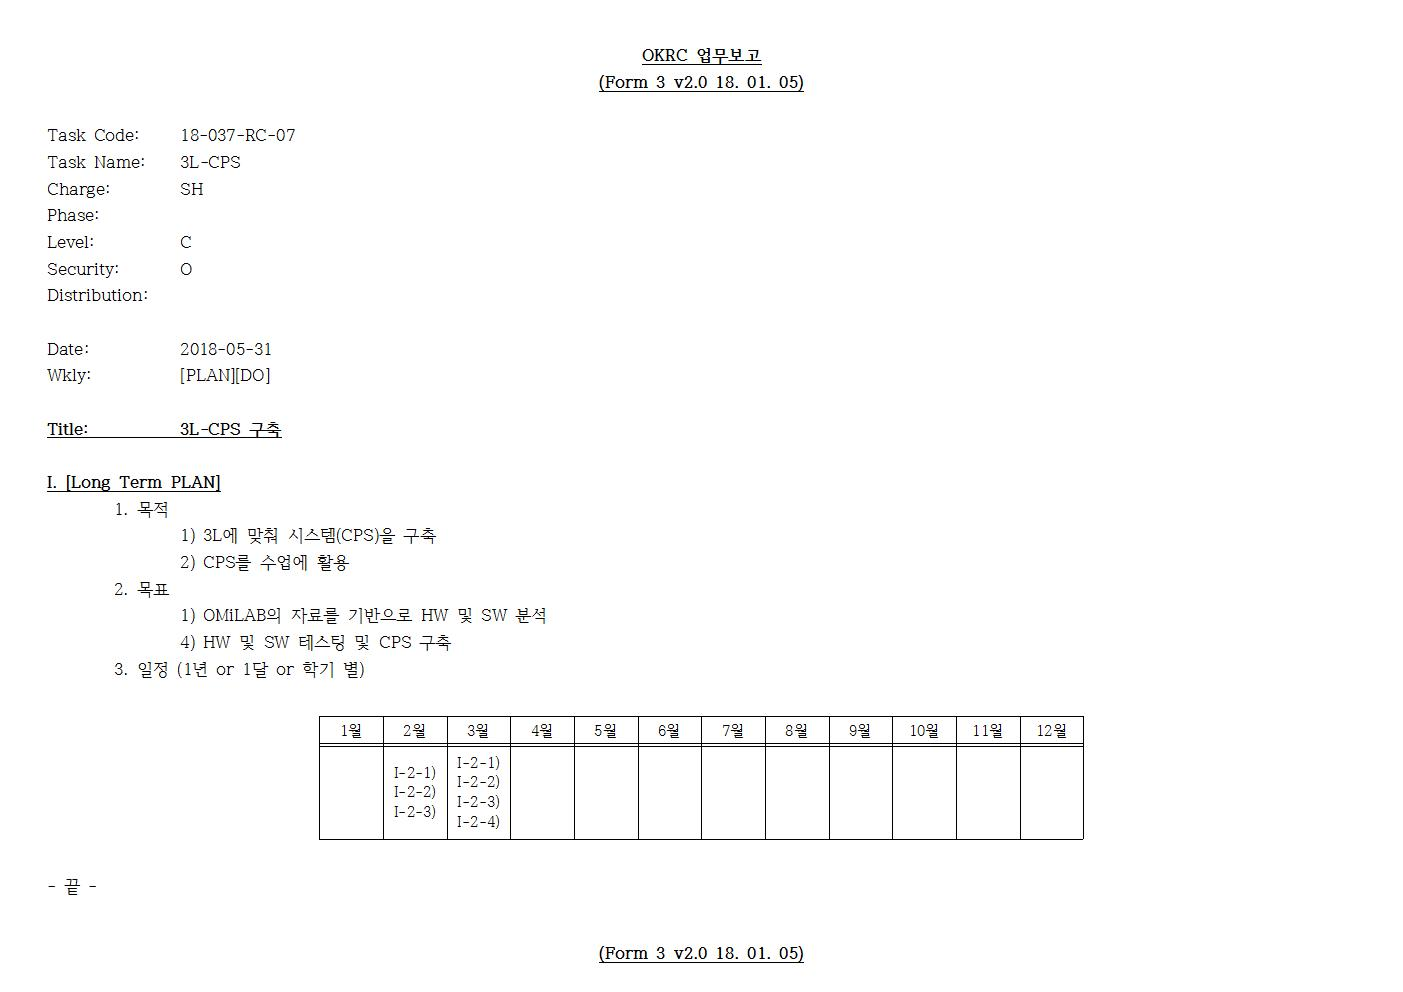 D-[18-037-RC-07]-[3L-CPS]-[2018-05-31][SH]001.jpg